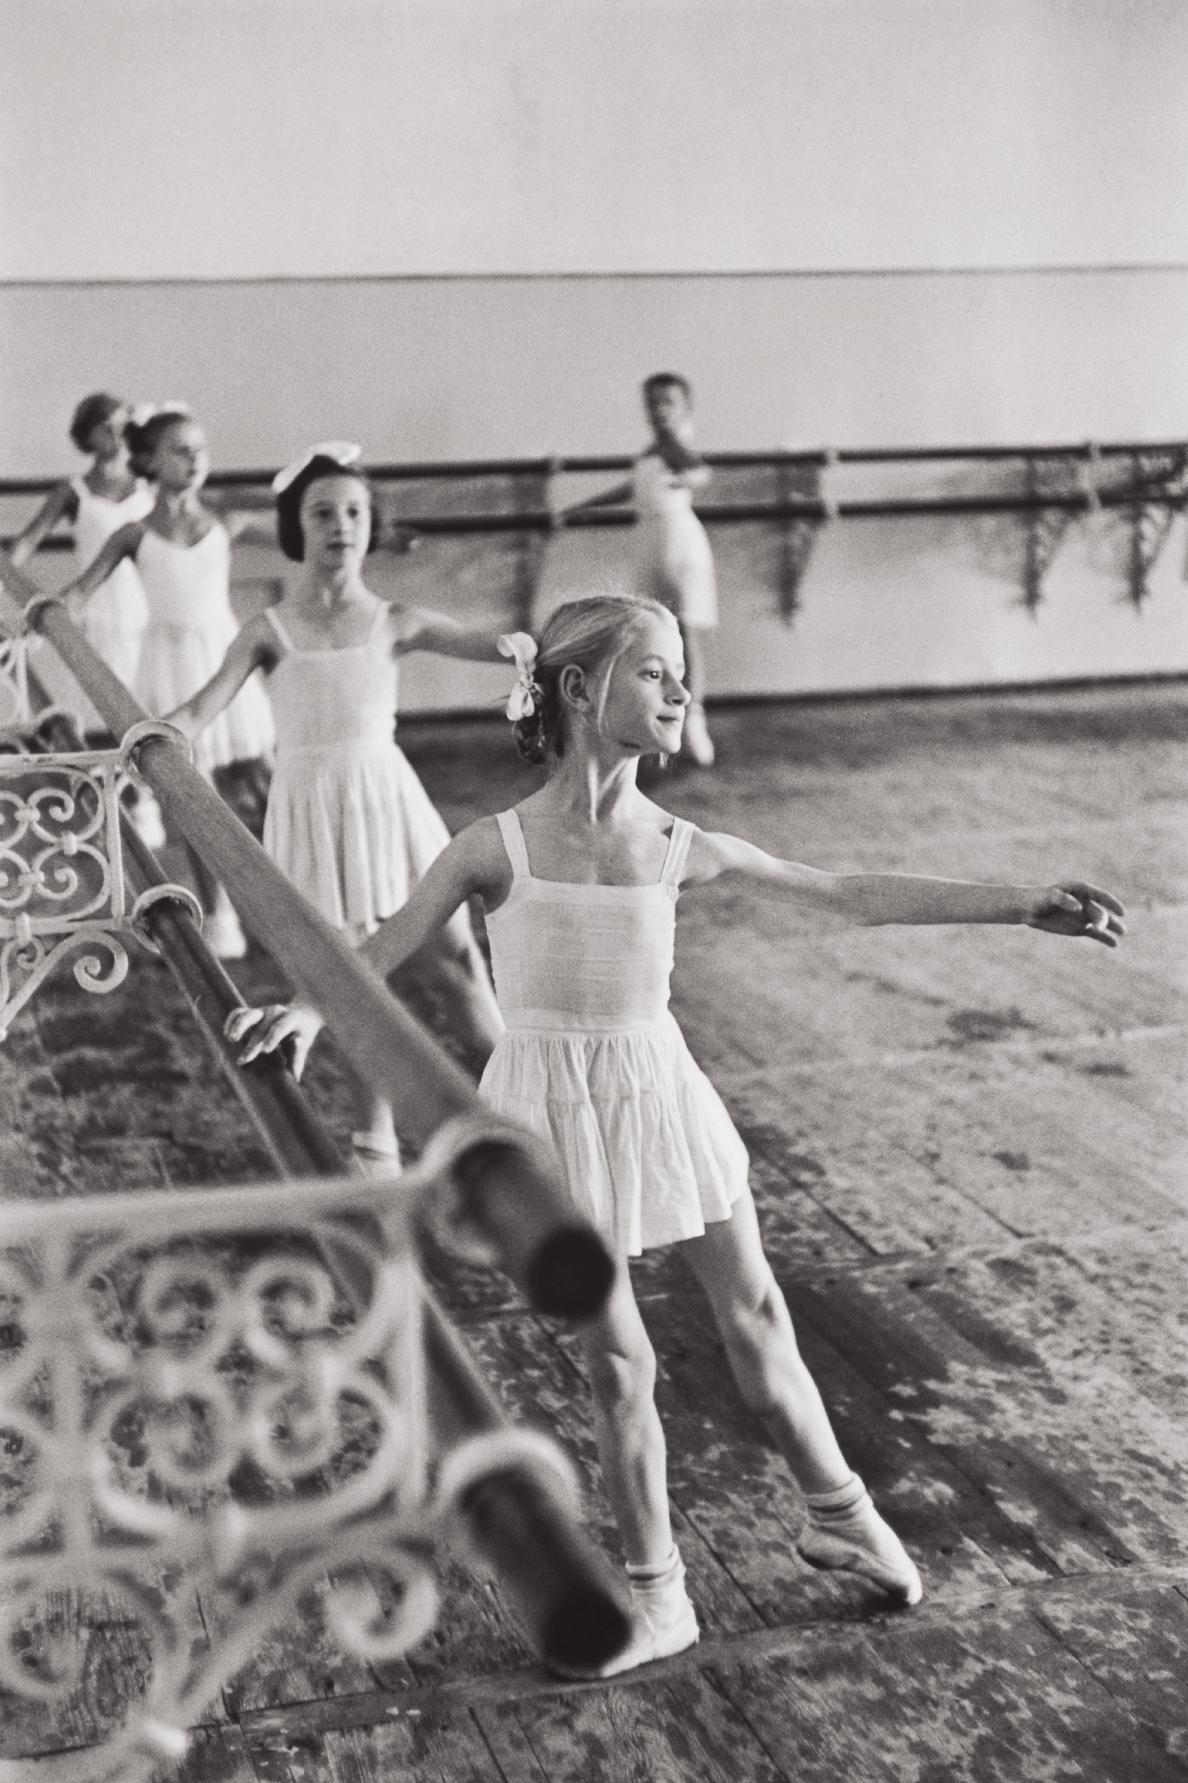 Henri Cartier-Bresson-Bolshoi Ballet School, Moscow, Ussr-1954